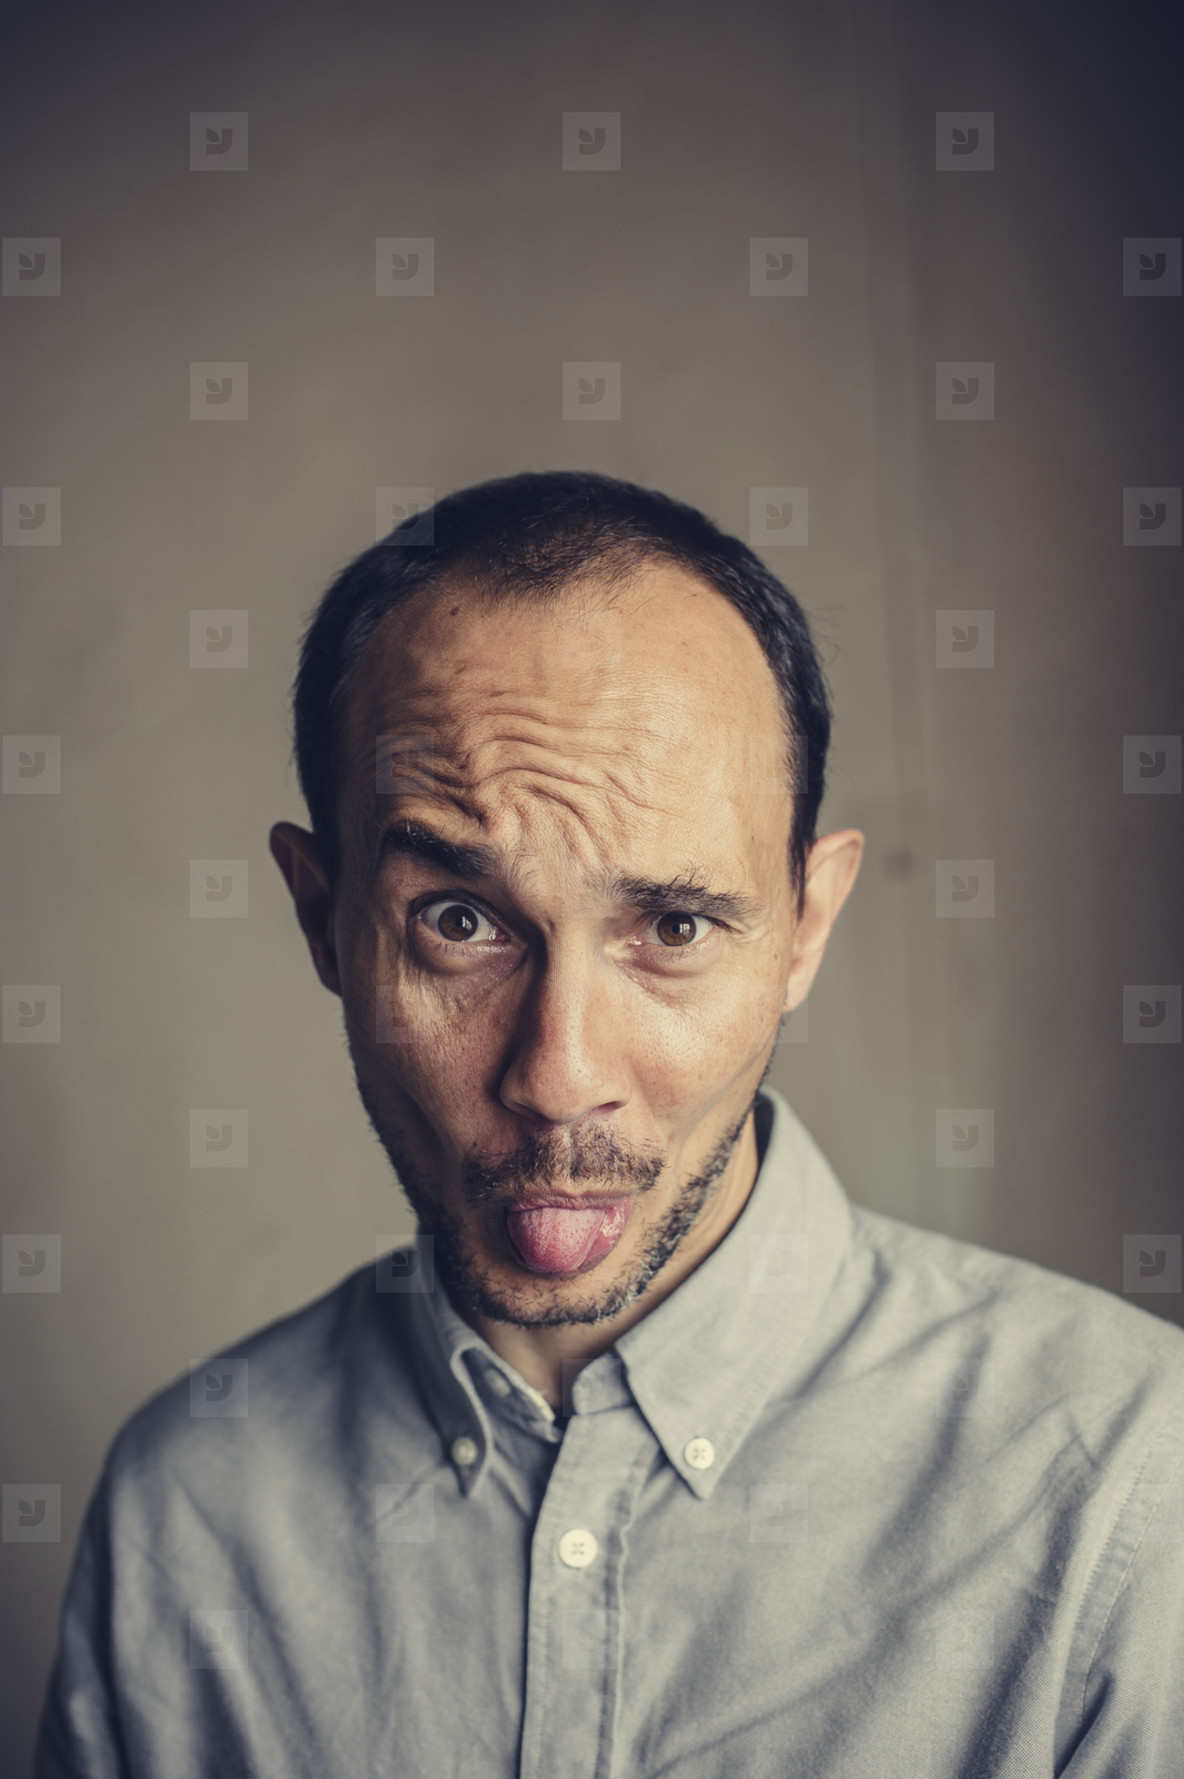 Funny mid aged bearded man joking